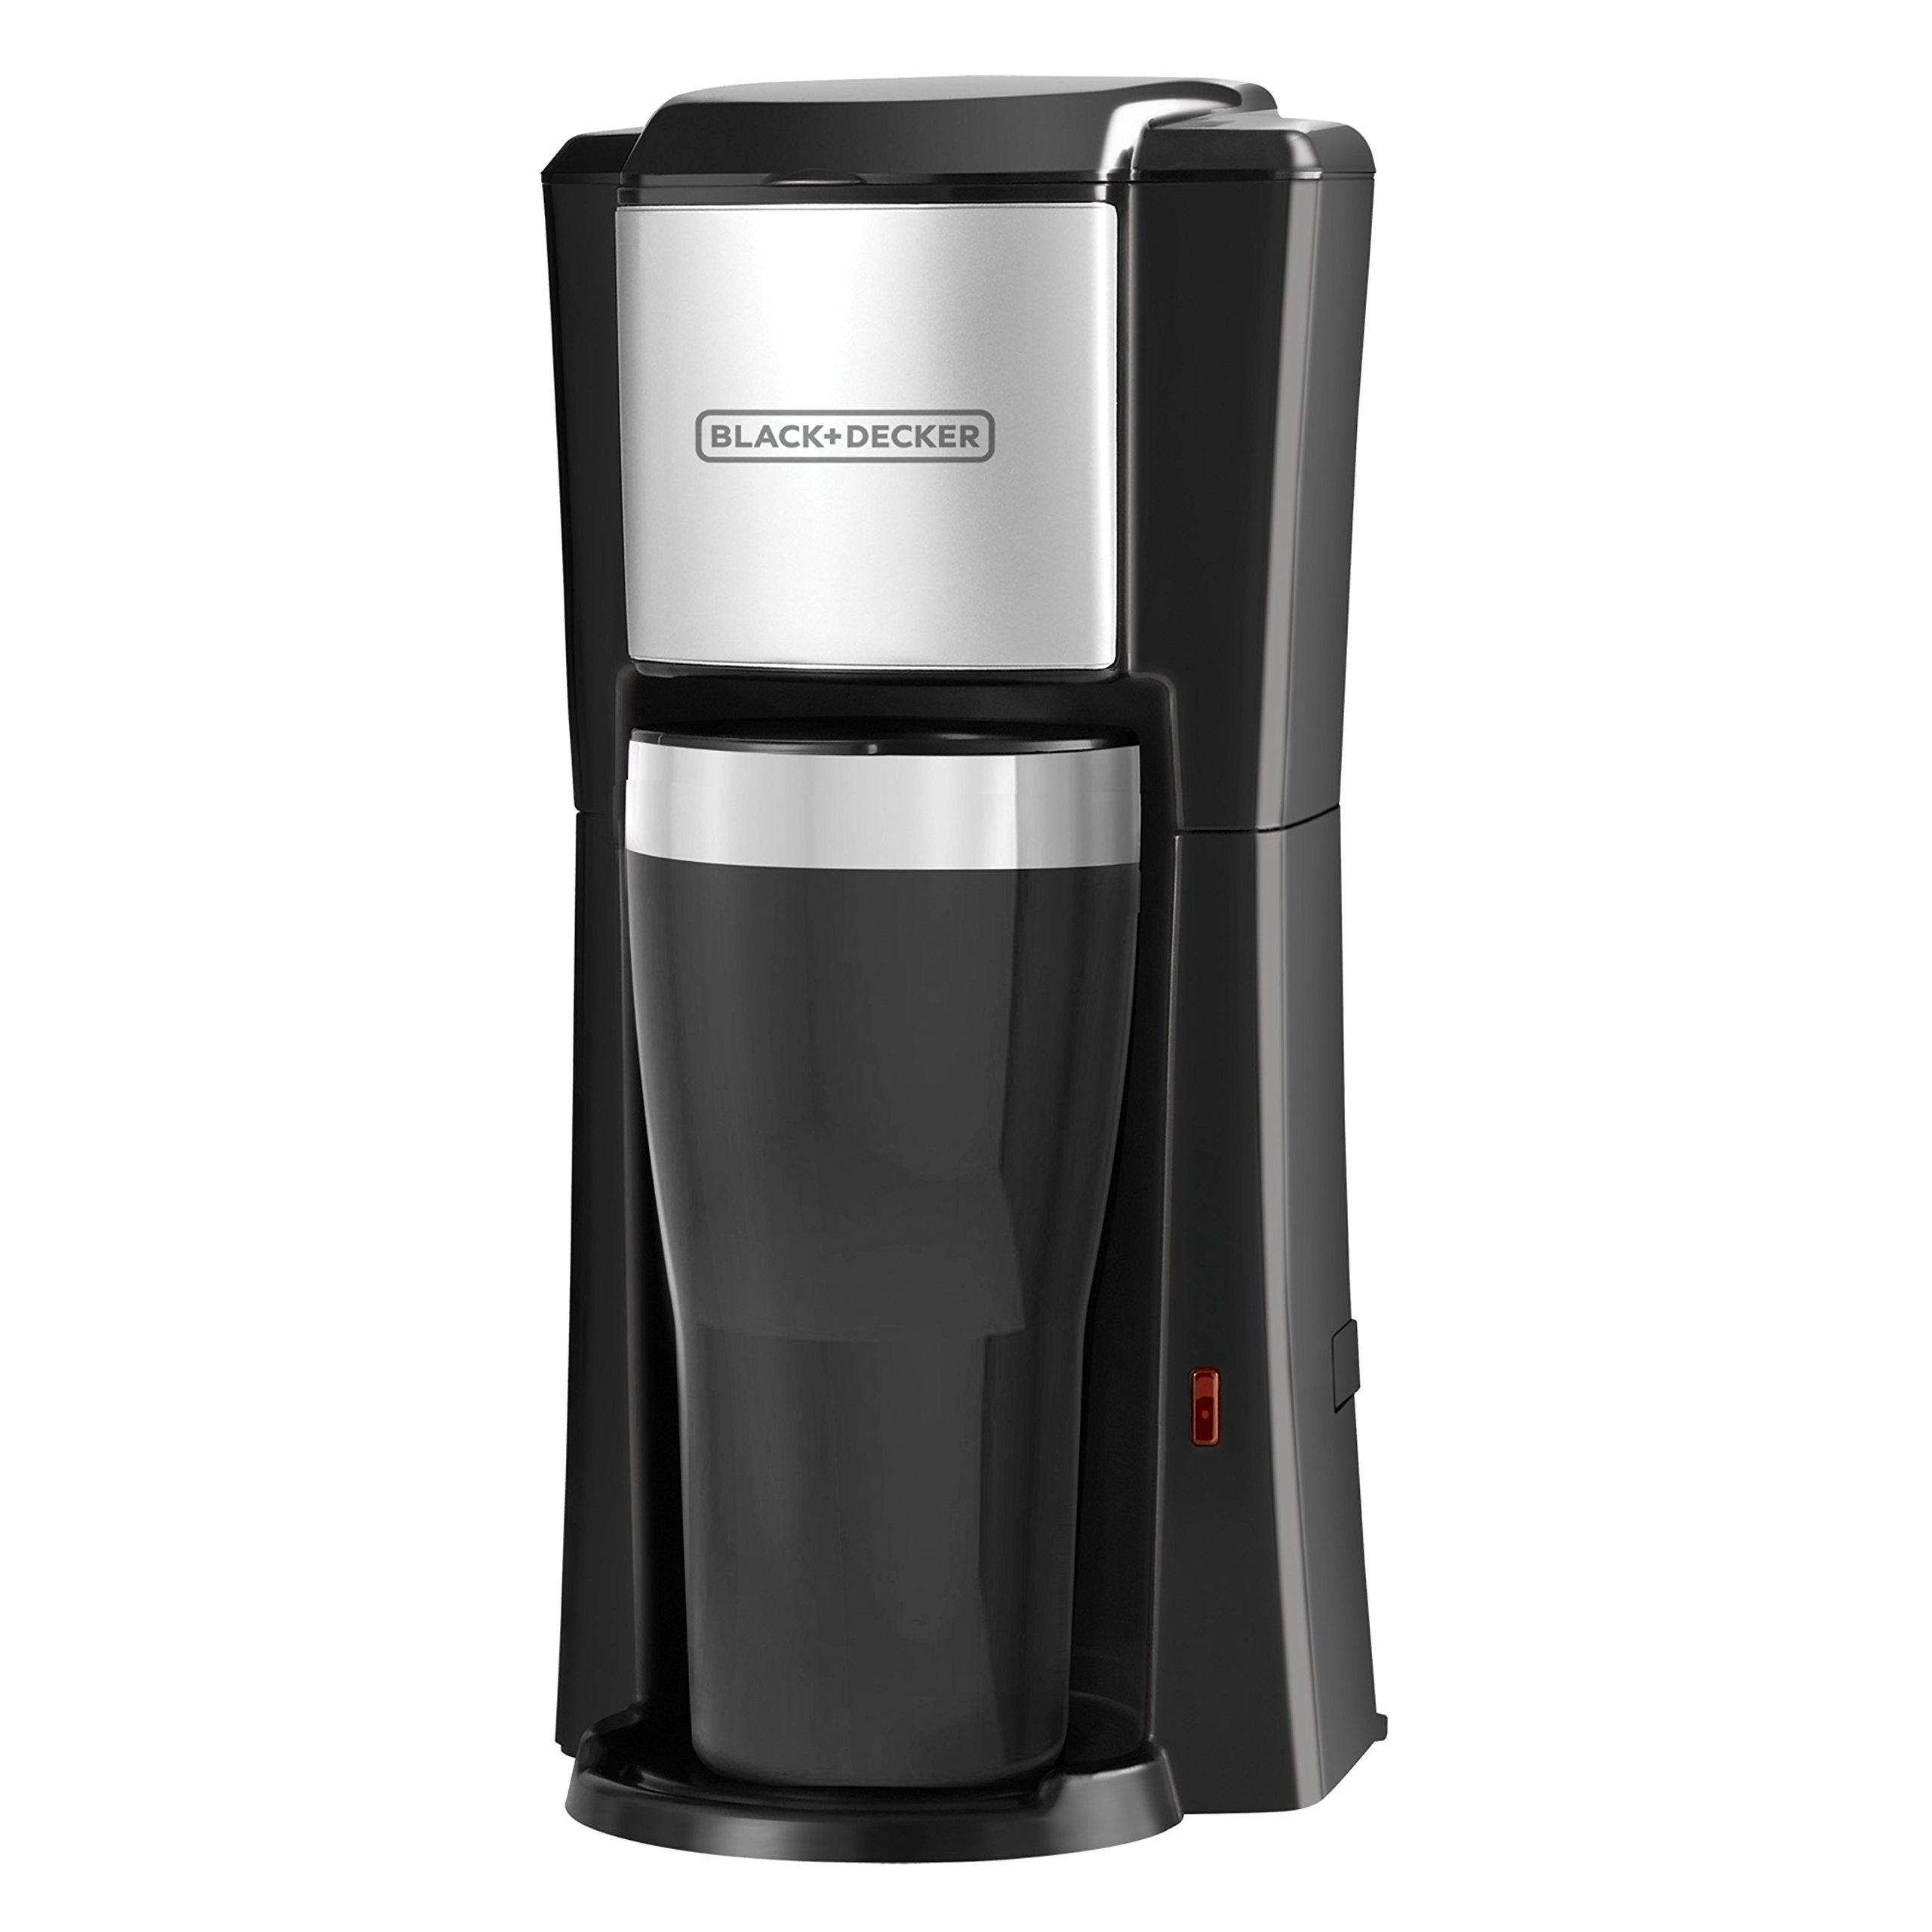 BLACK DECKER Single Coffeemaker CM618